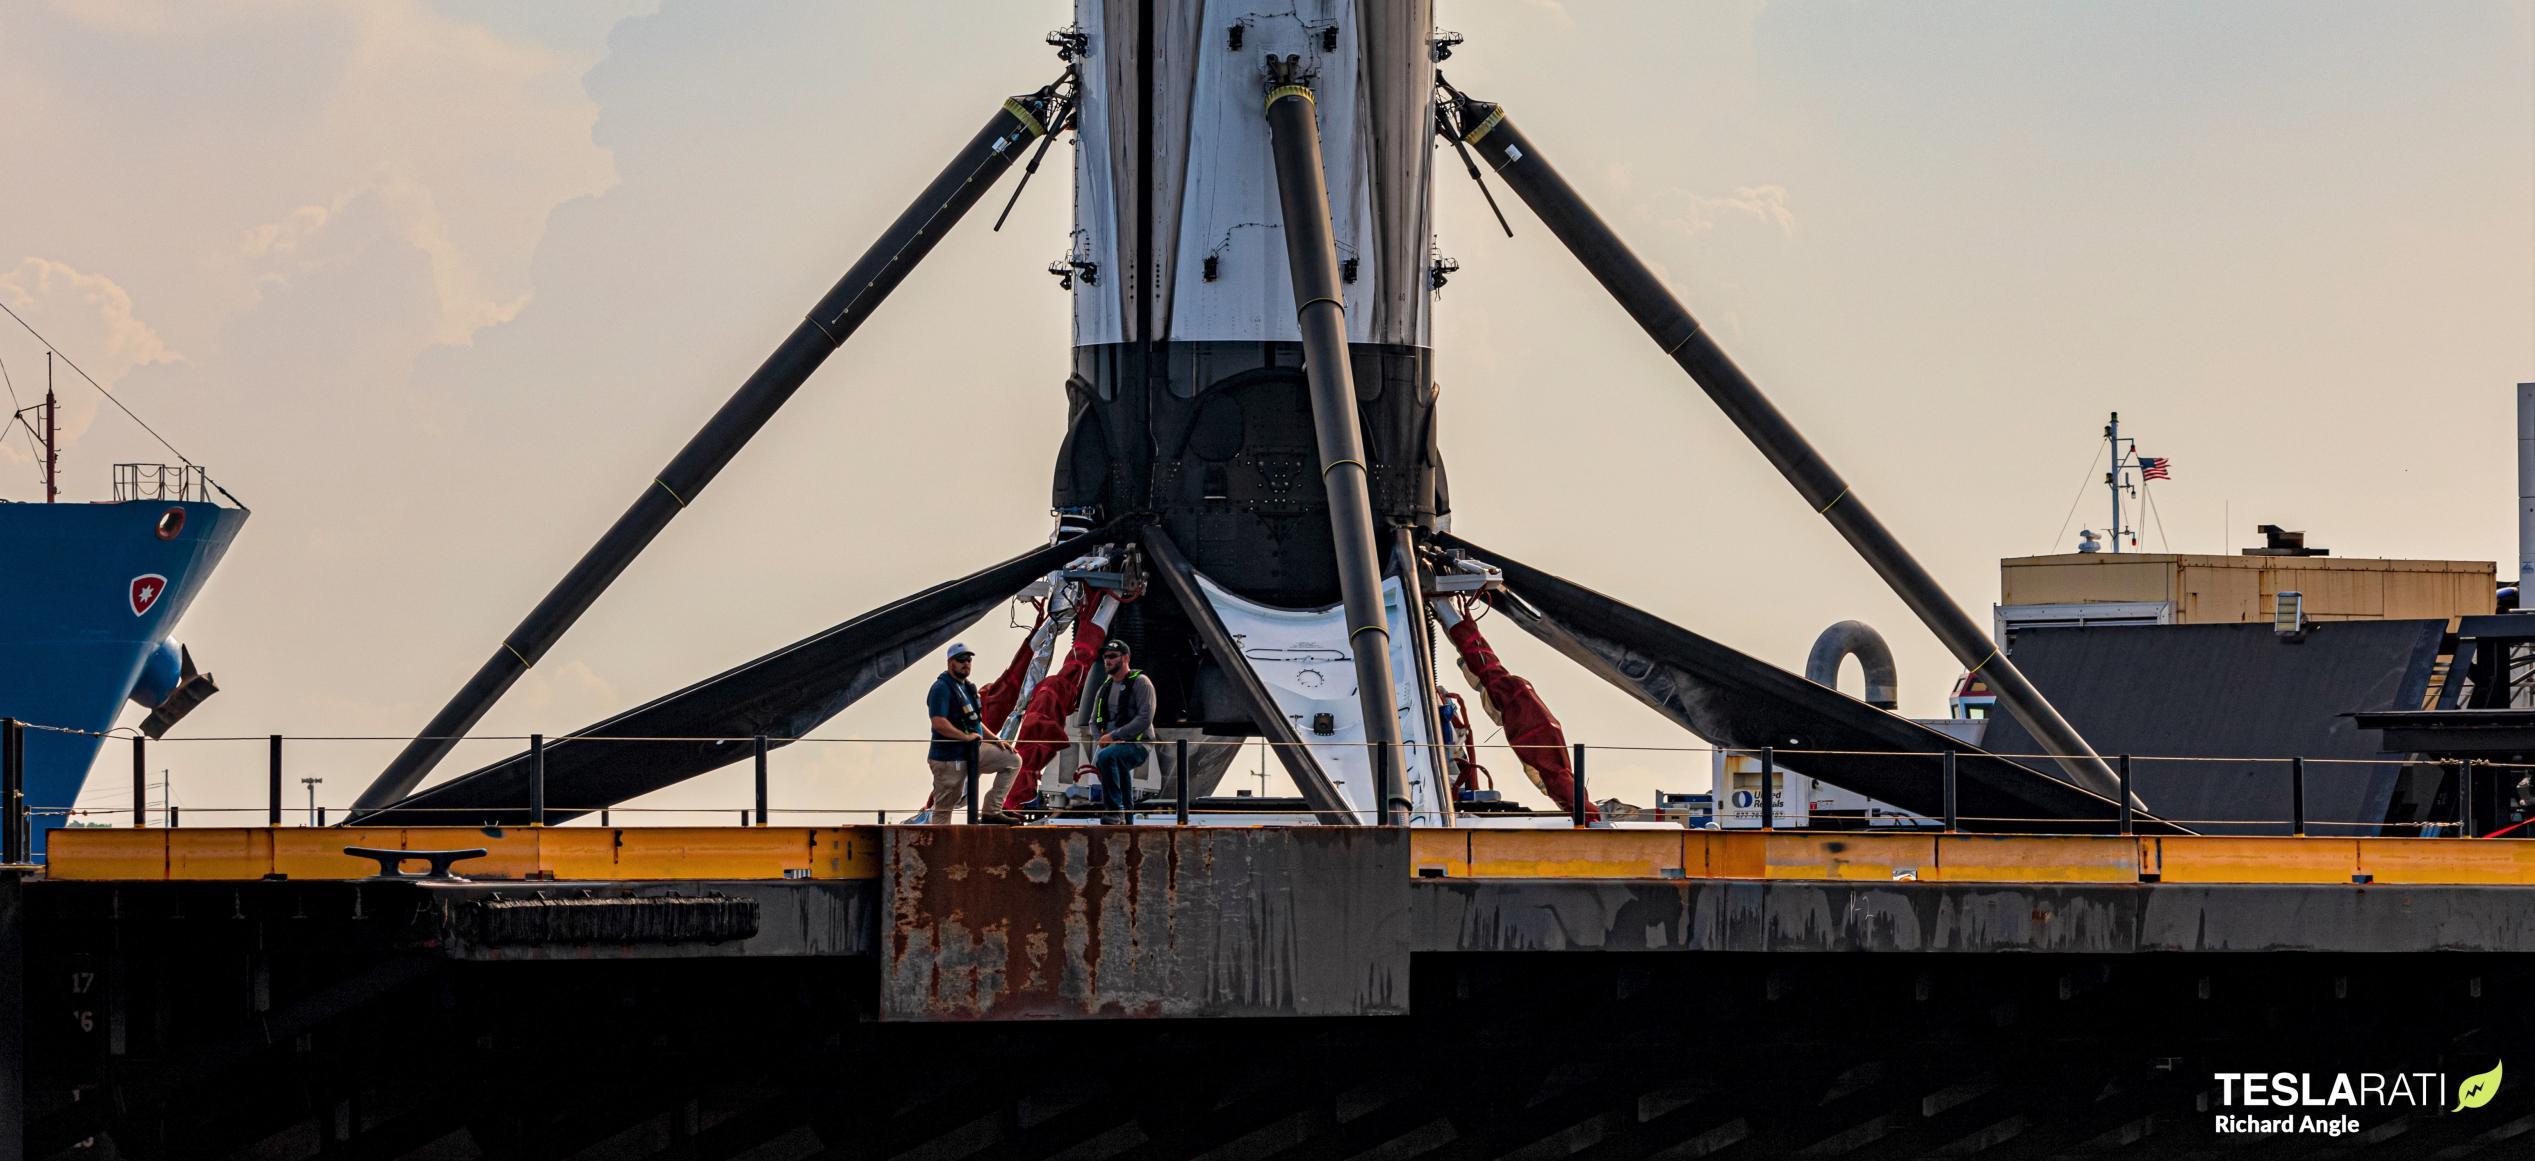 GPS III SV03 Falcon 9 B1060 070420 (Richard Angle) OCISLY return 5 edit crop 1 (c)